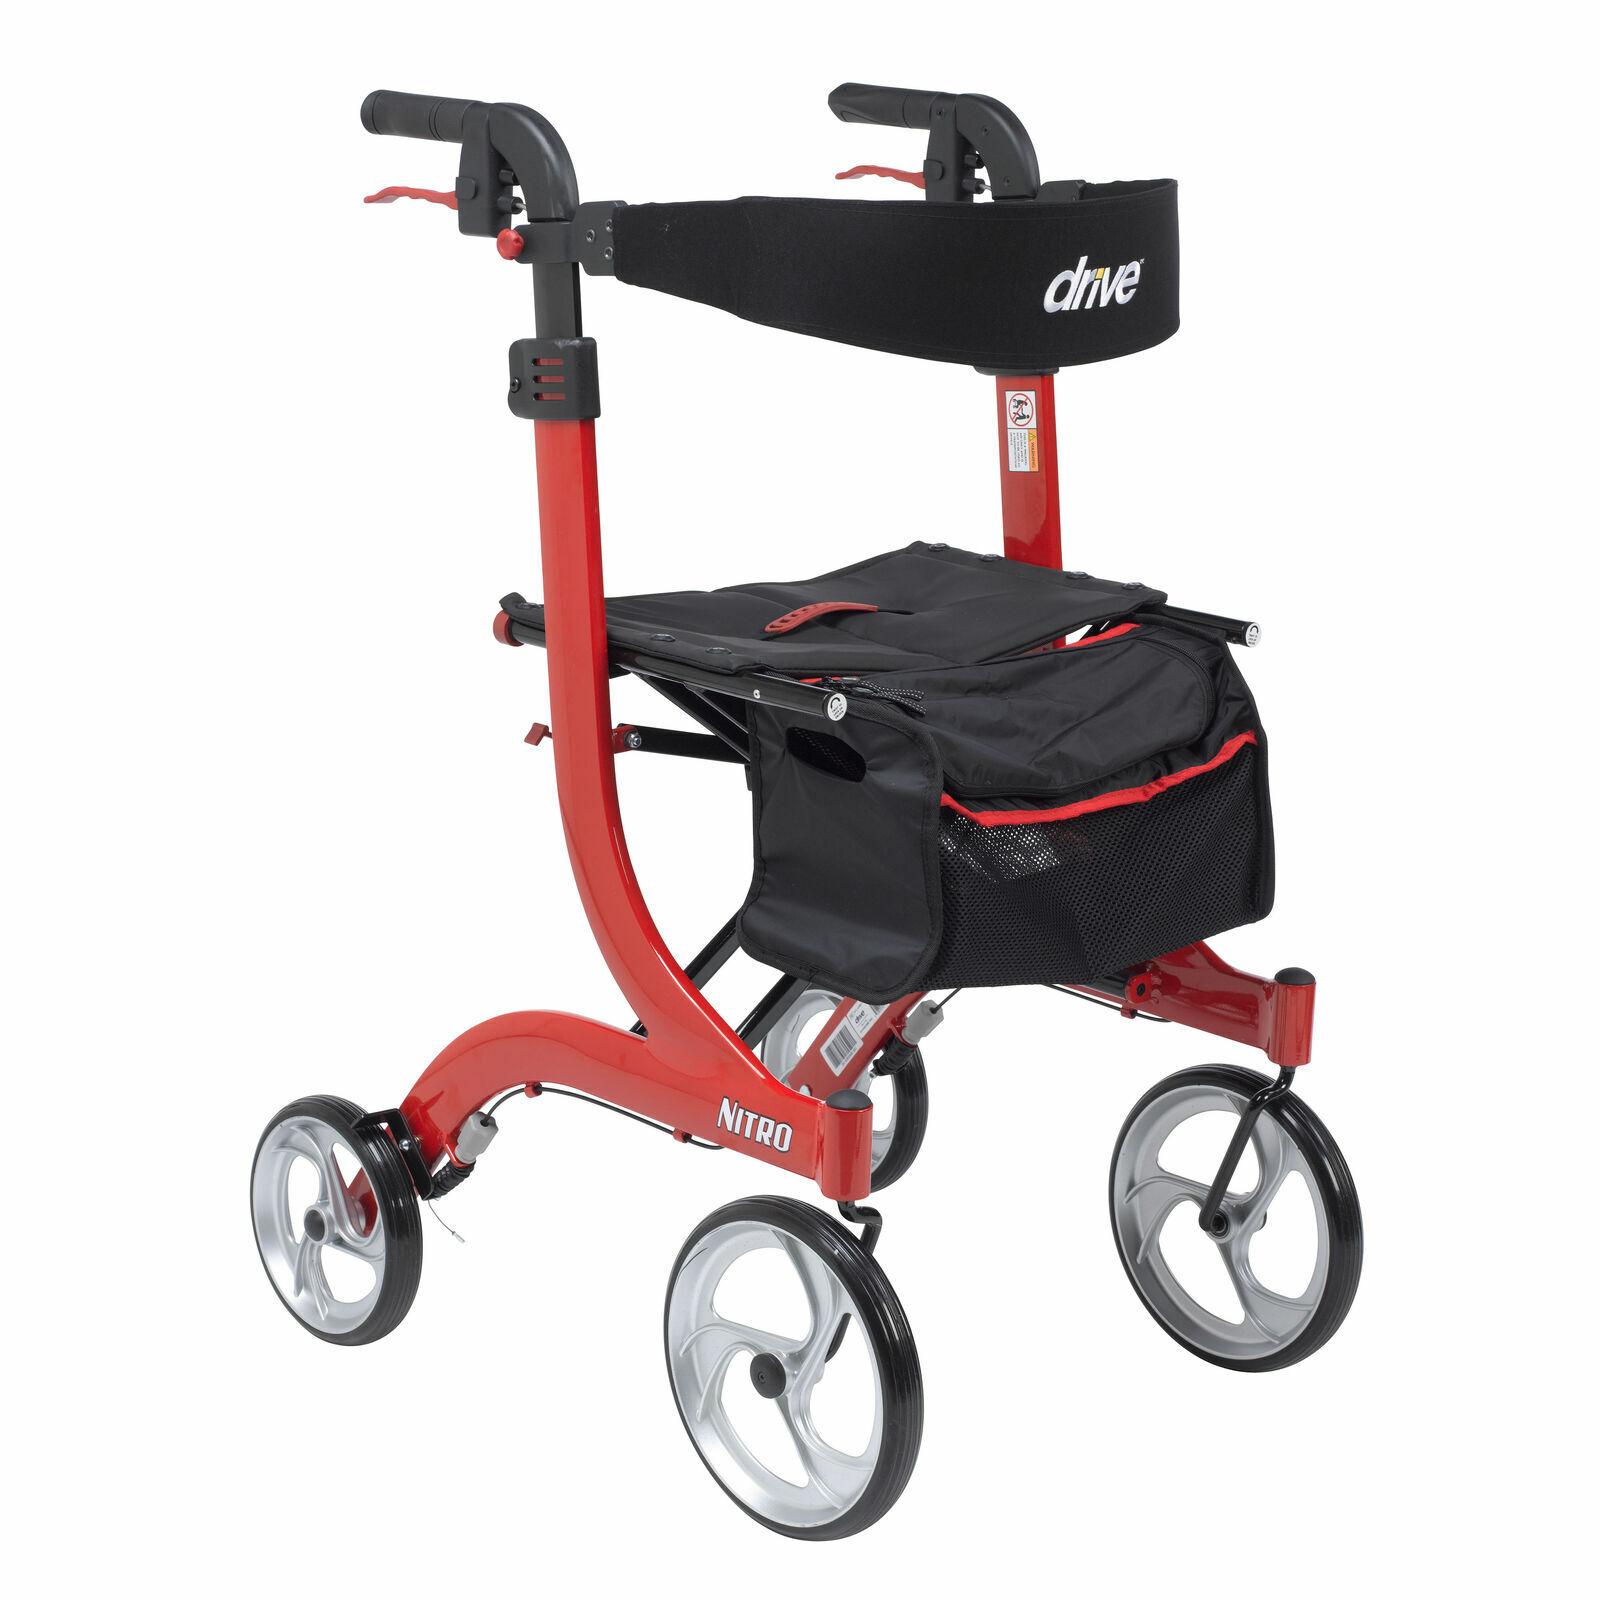 nitro euro style walker rollator - tall in red   rtl10266-t